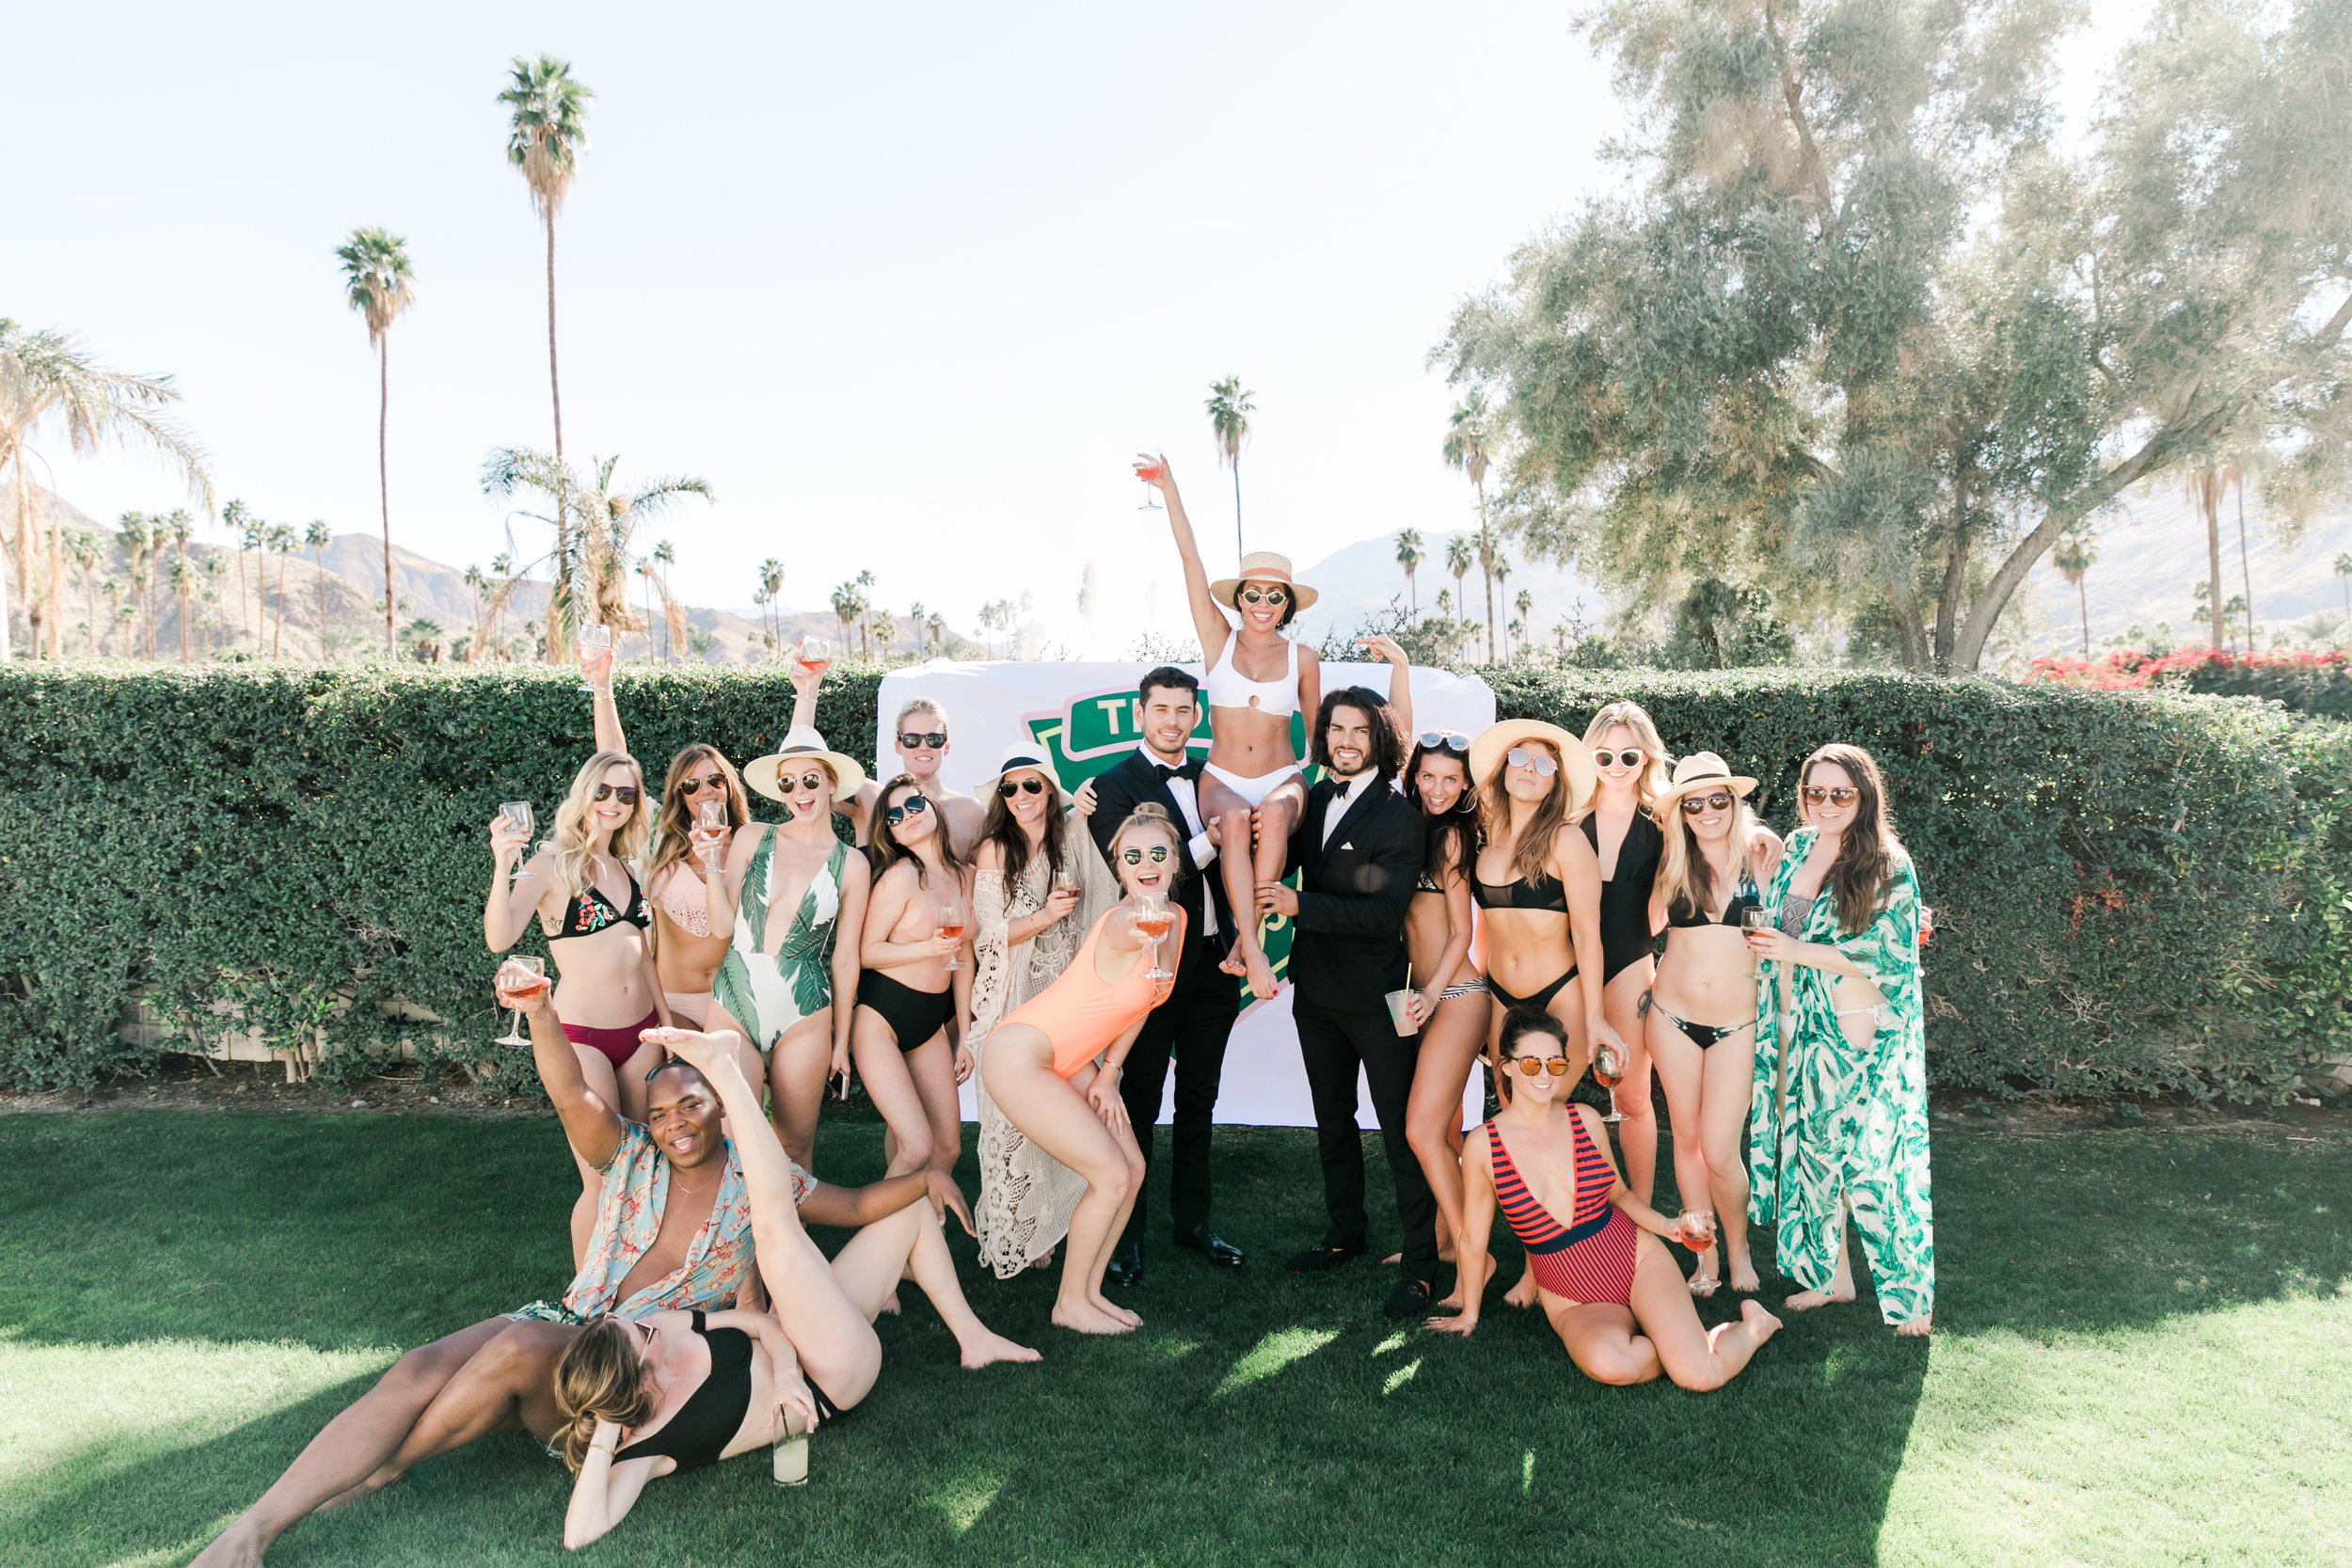 Manservants at Palm Springs Bachelorette Party